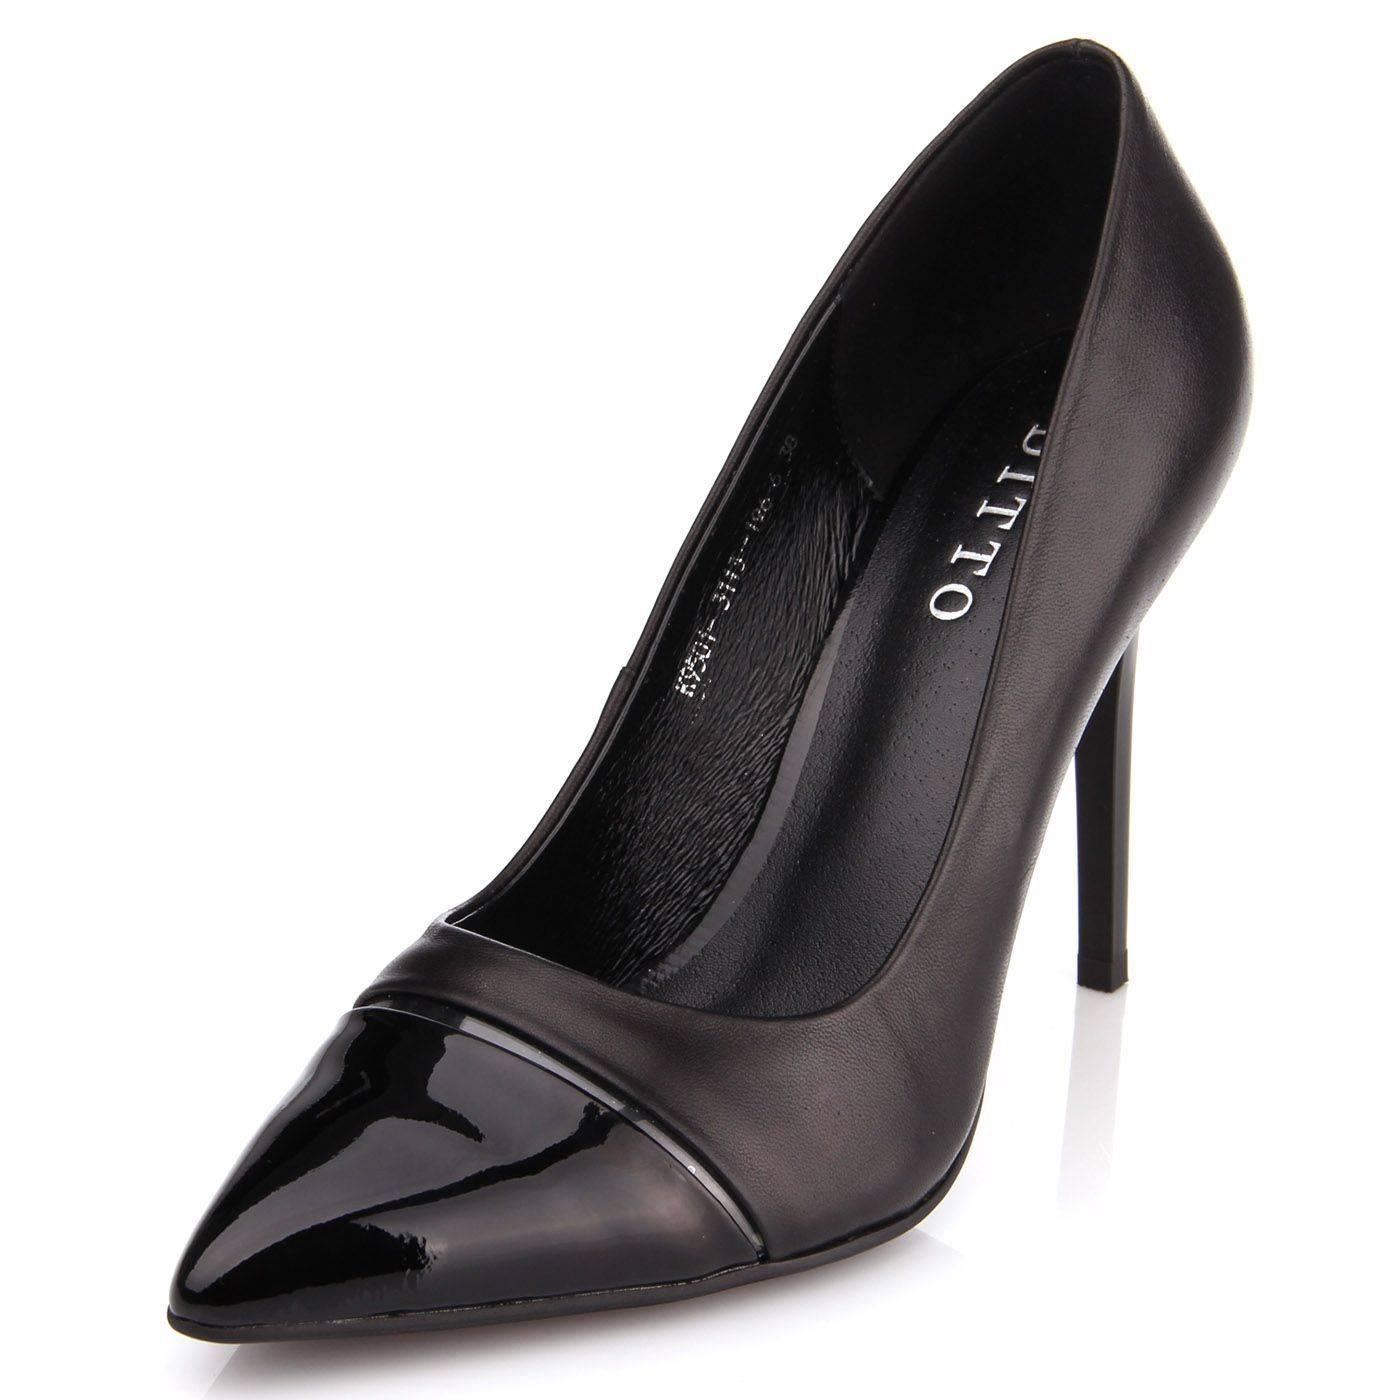 Туфлі жіночі ditto 4351 Чорний купить по выгодной цене в интернет ... bafa9a9b88bd9